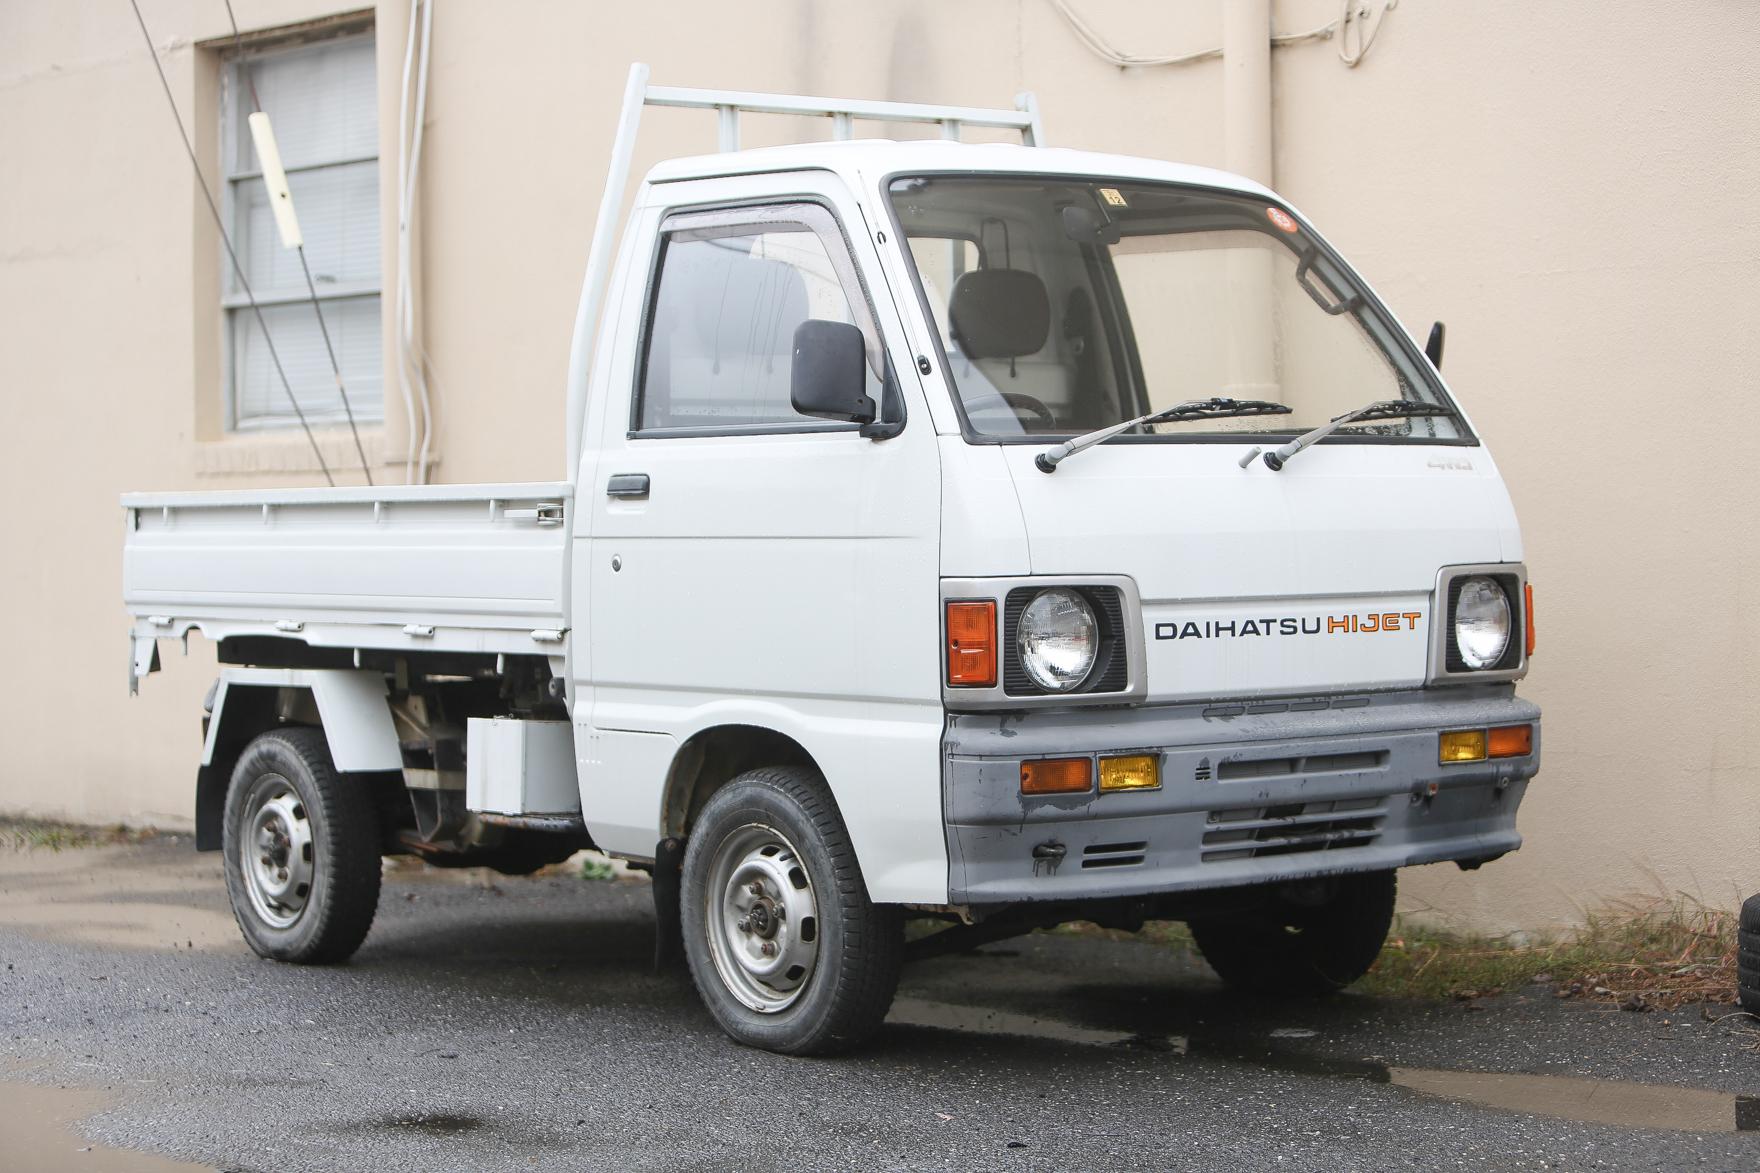 1989 Daihatsu Hijet Dump bed with Scissor Lift - $15,000